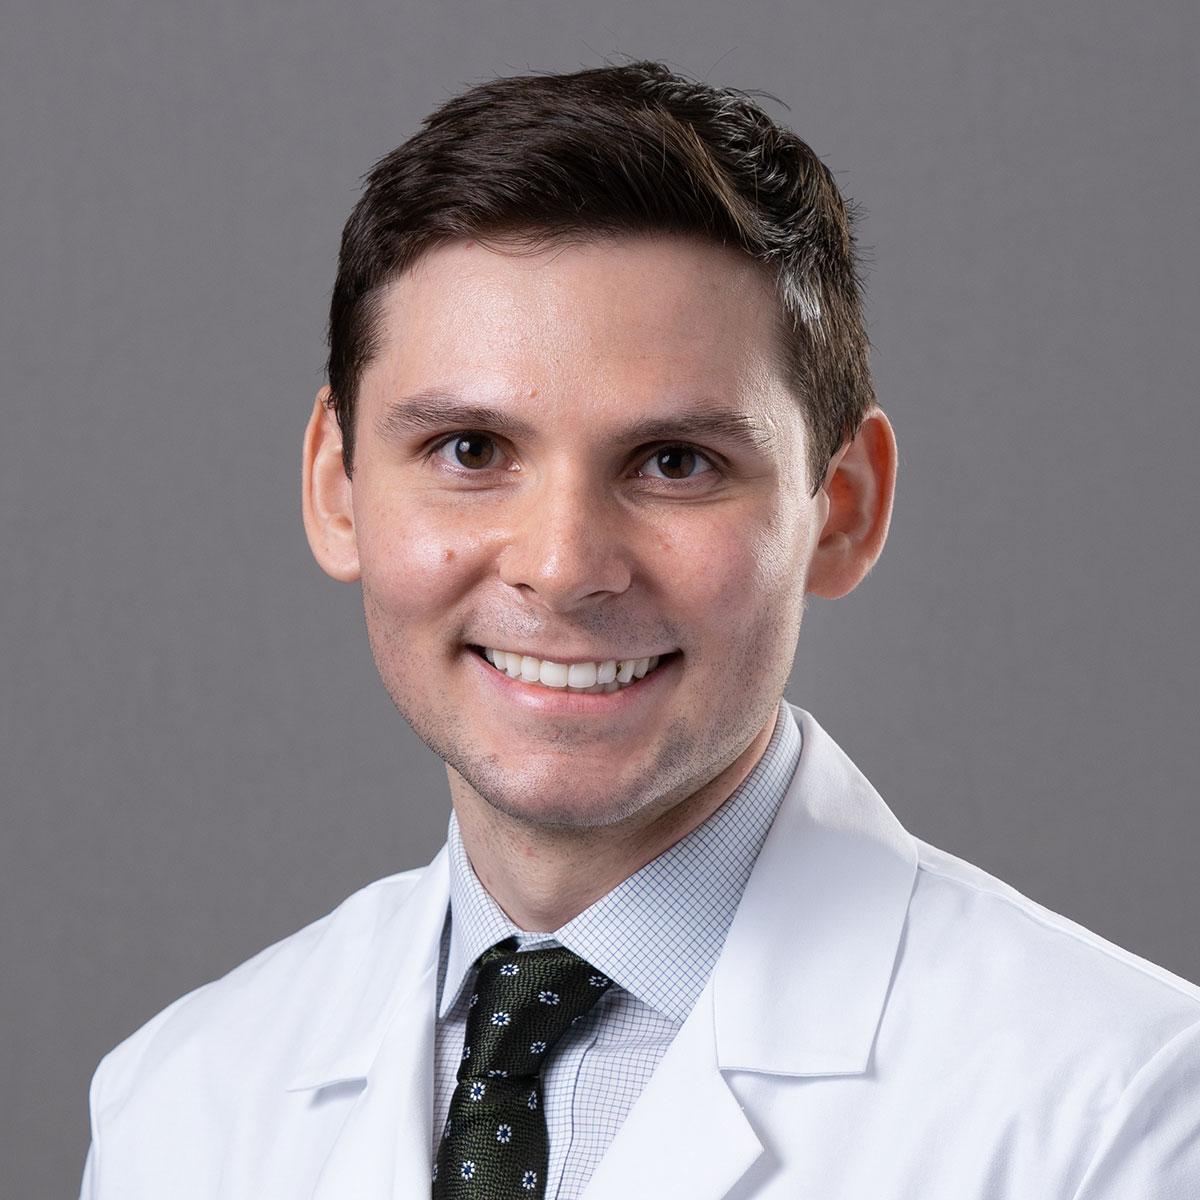 A friendly headshot of Dr. David Lakomy